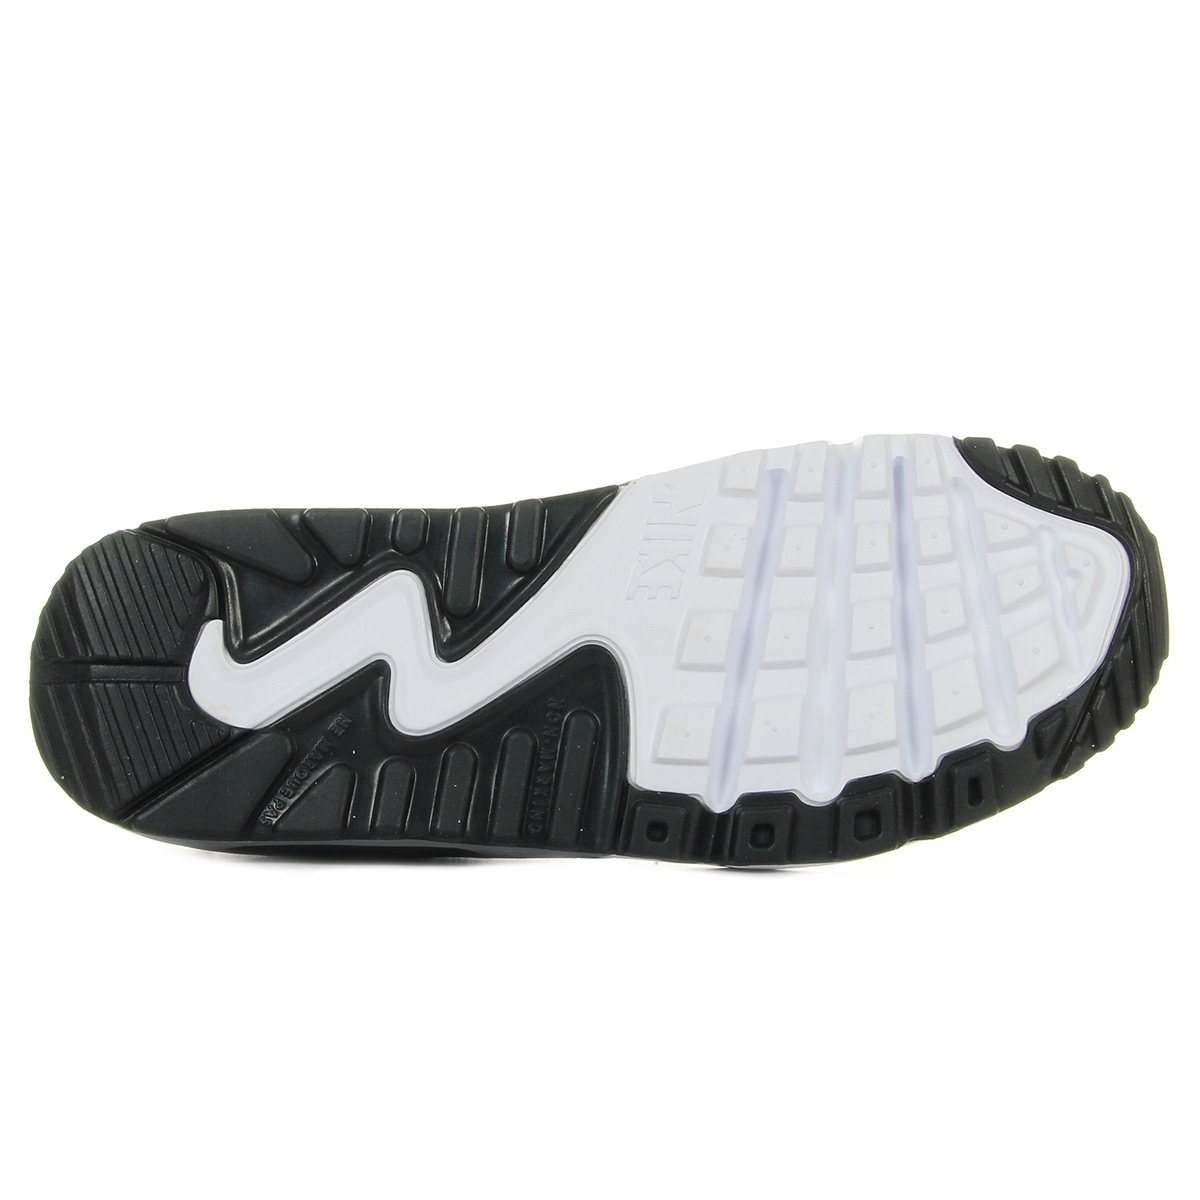 Nike Air Max 90 LTR 833376601, Baskets mode femme